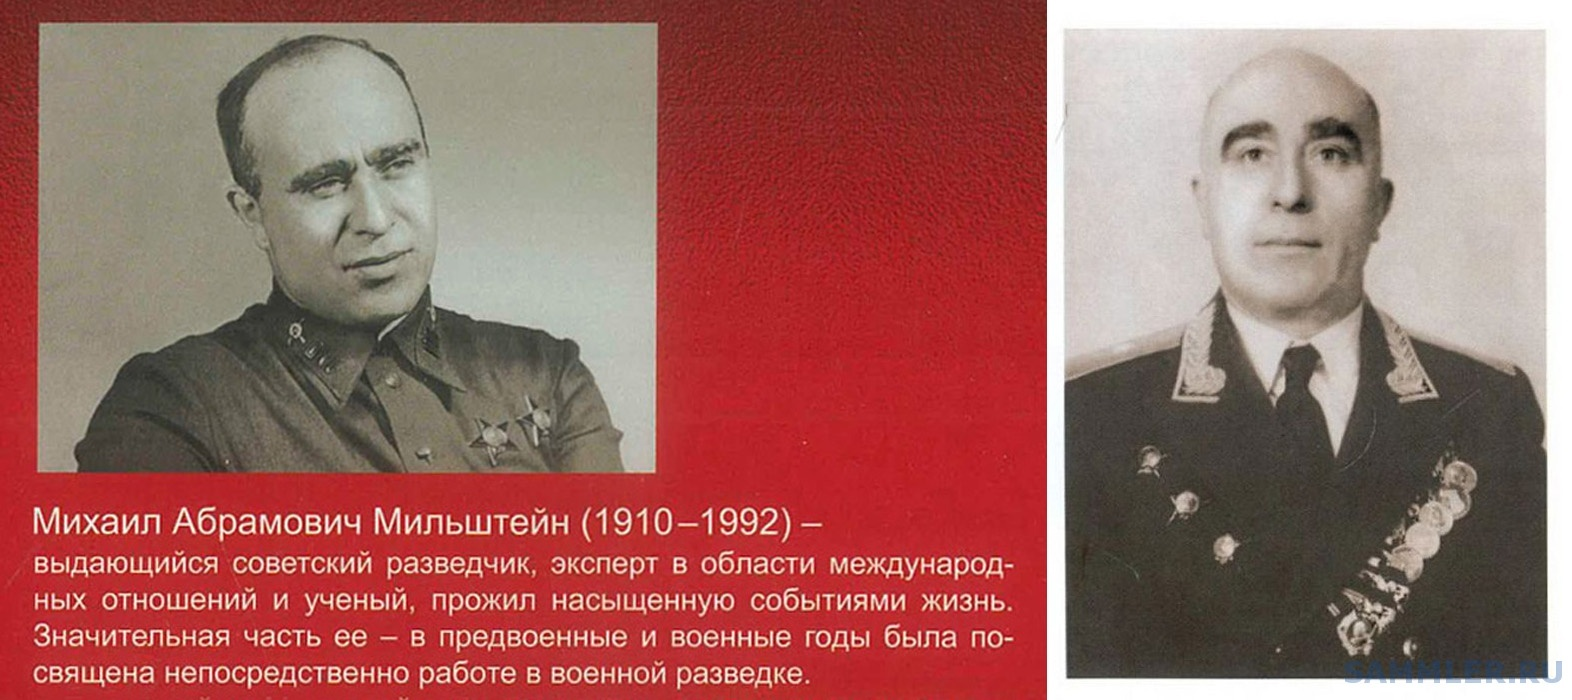 Мильштейн Михаил Абрамович --.jpg